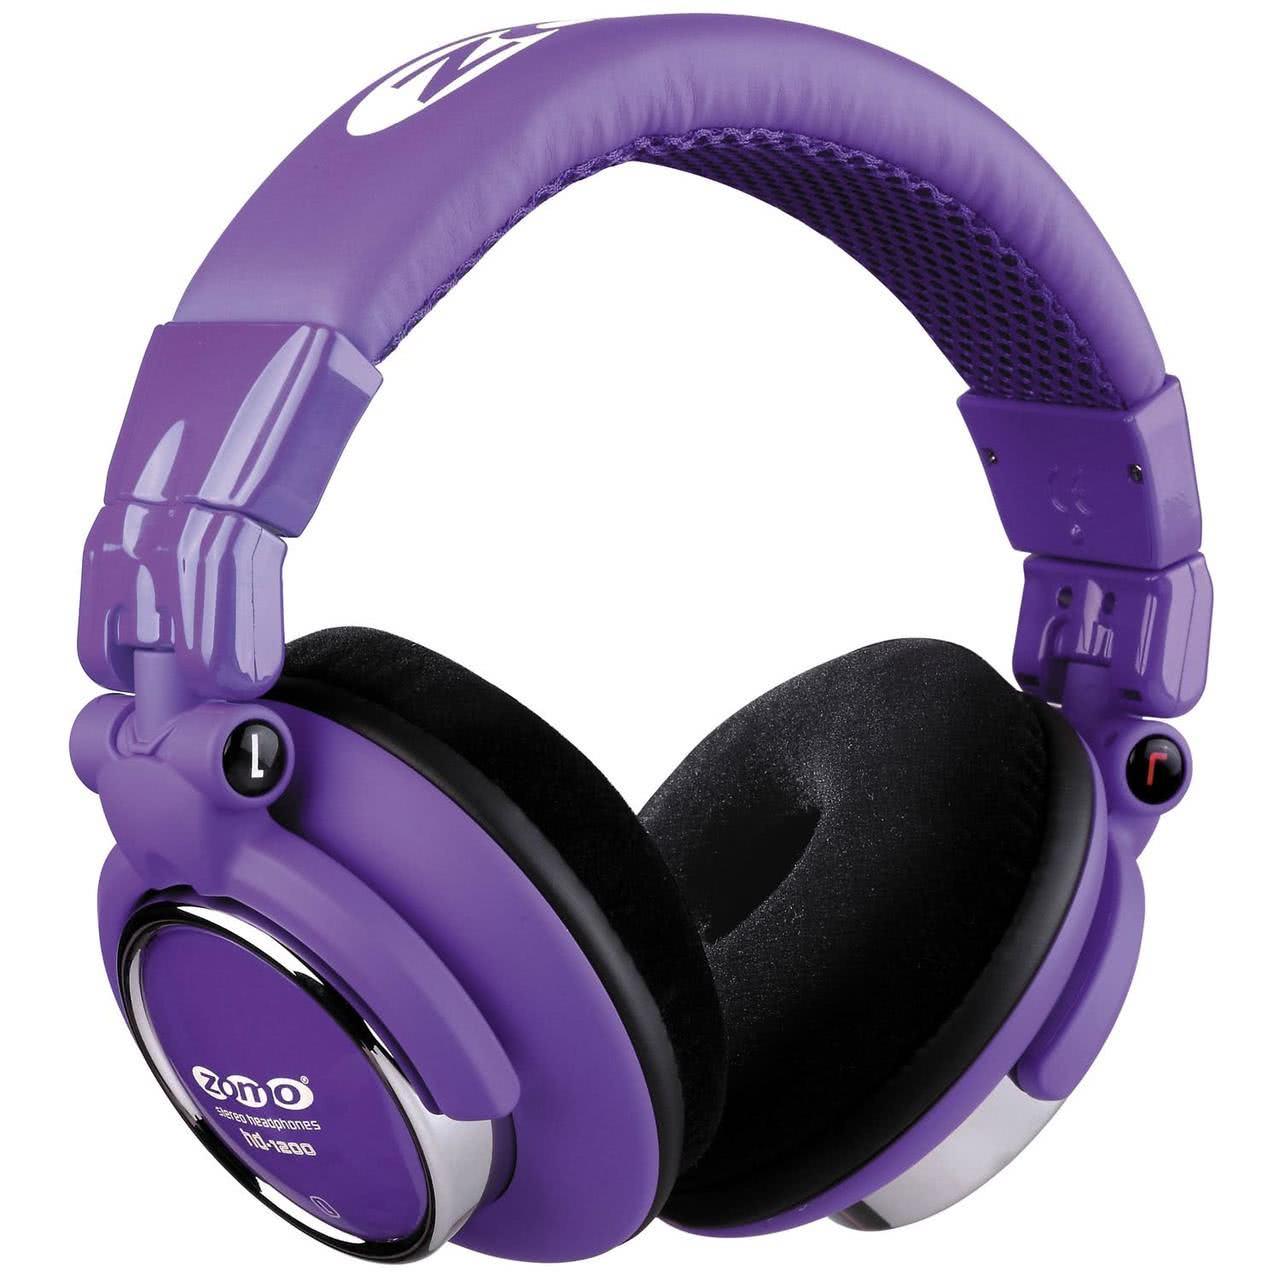 Zomo HD-1200 purple